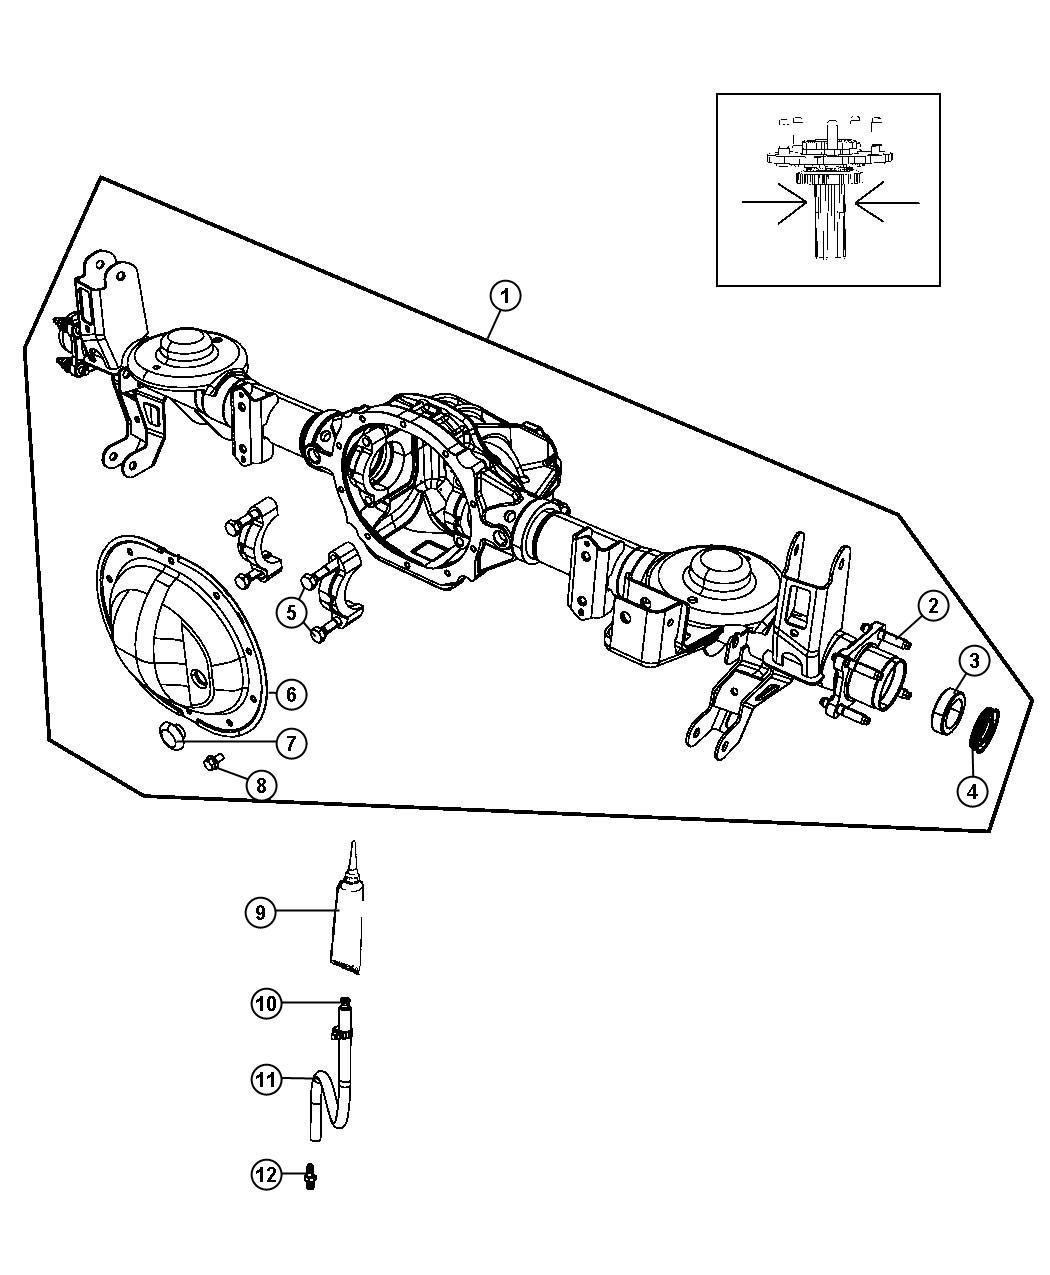 Jeep Liberty Housing. Rear axle. [[3.21 axle ratio, 3.73